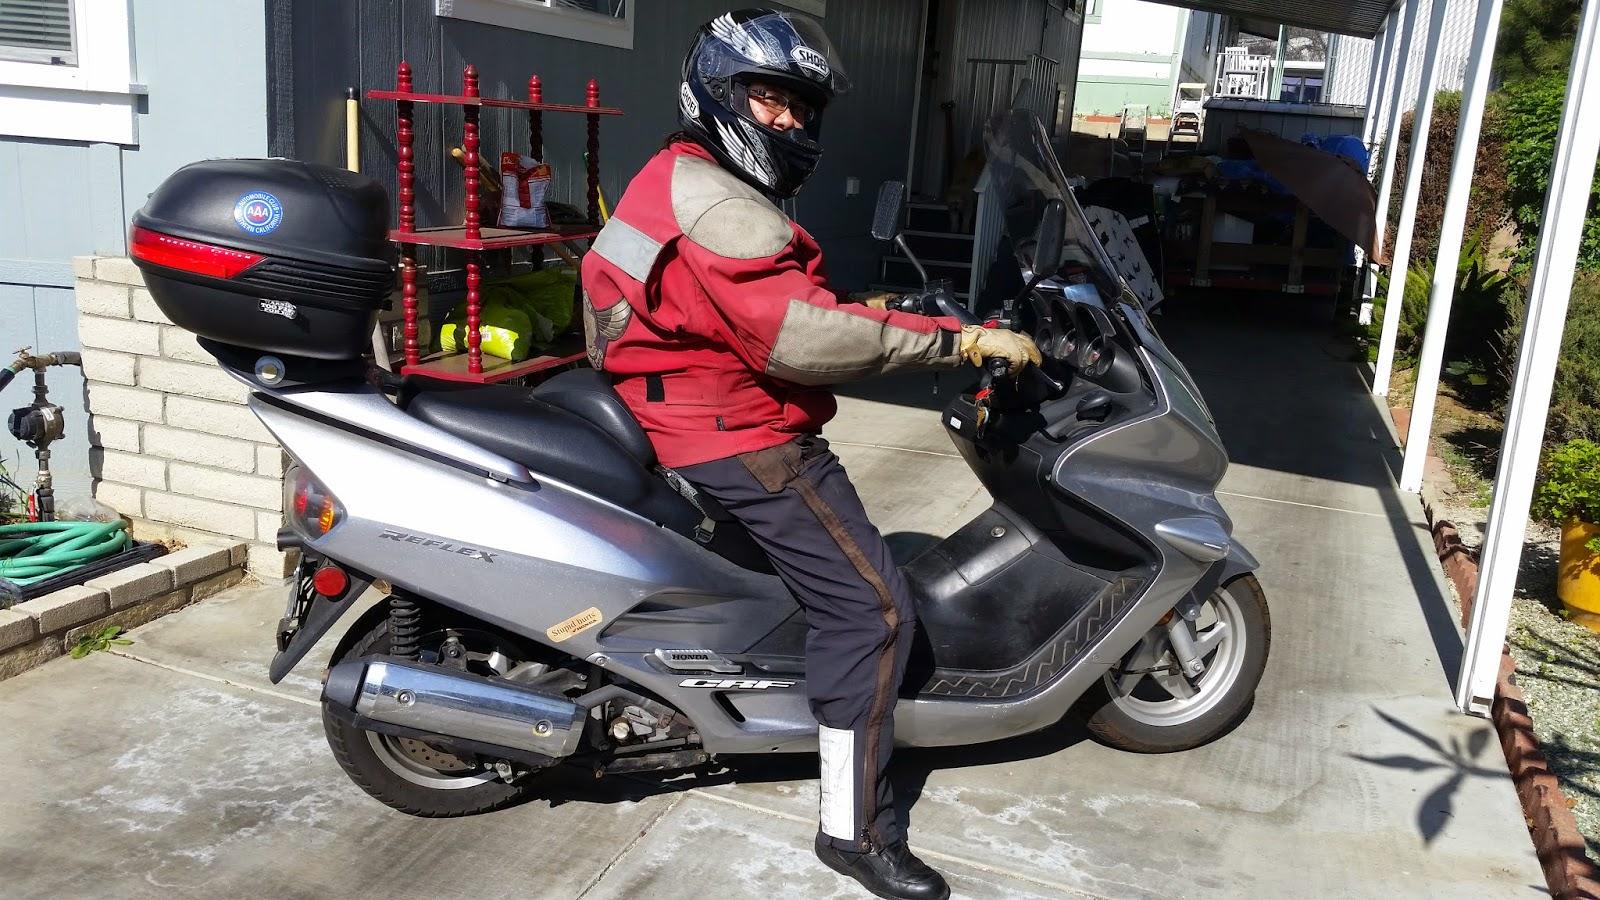 Two-Wheeled Tourist: Honda Reflex vs. CA Freeways - Life lessons ...